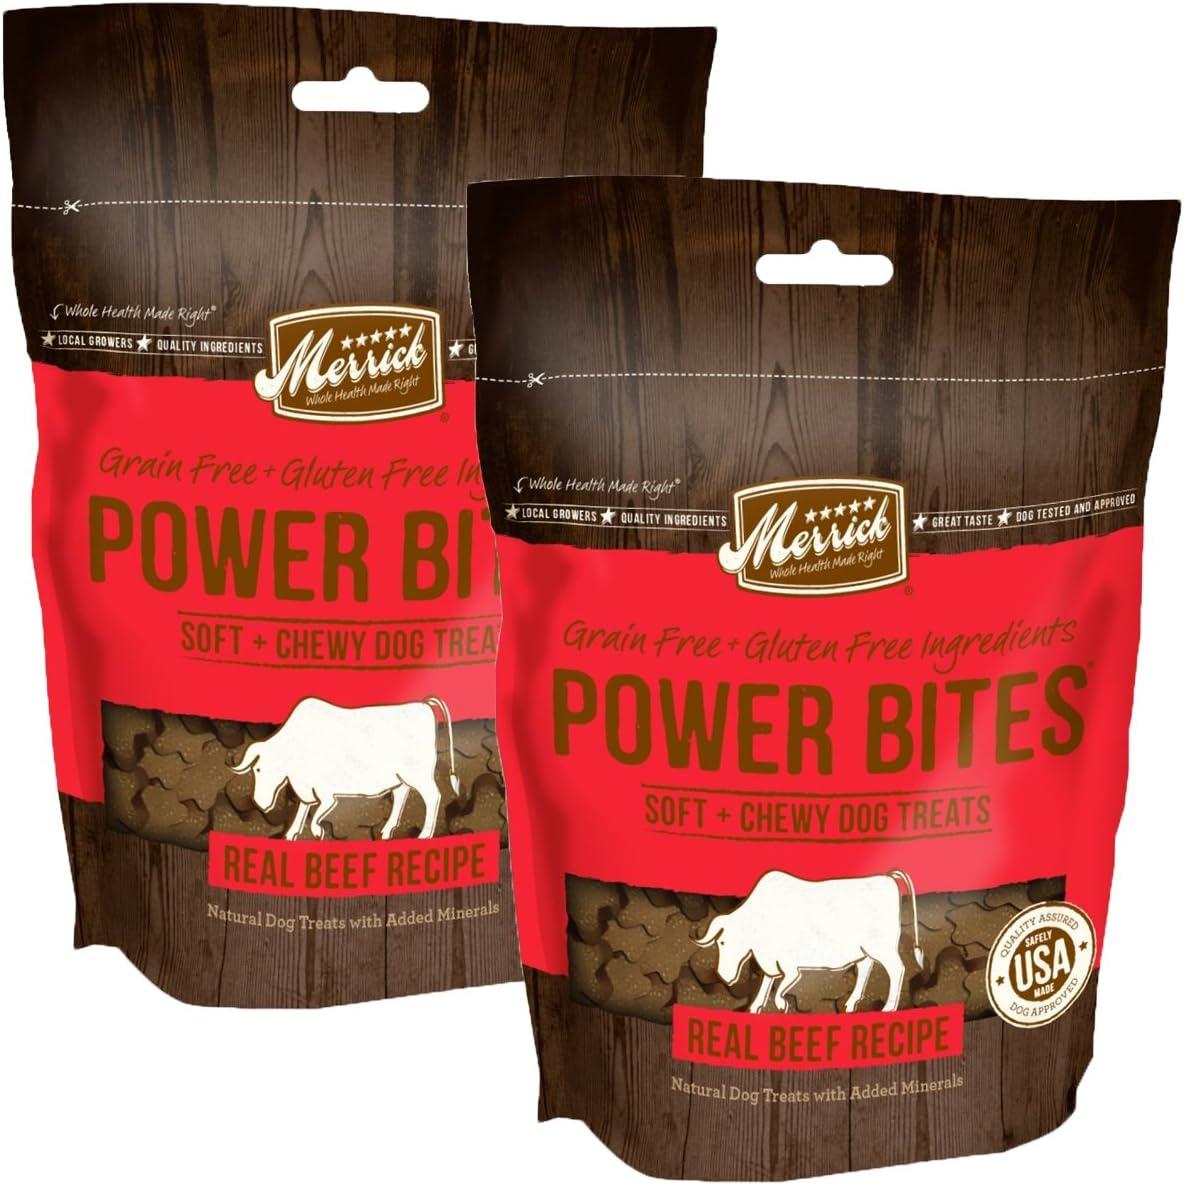 Merrick Grain Free Gluten Free Power Bites Dog Treats, 6 oz (Pack of 2)